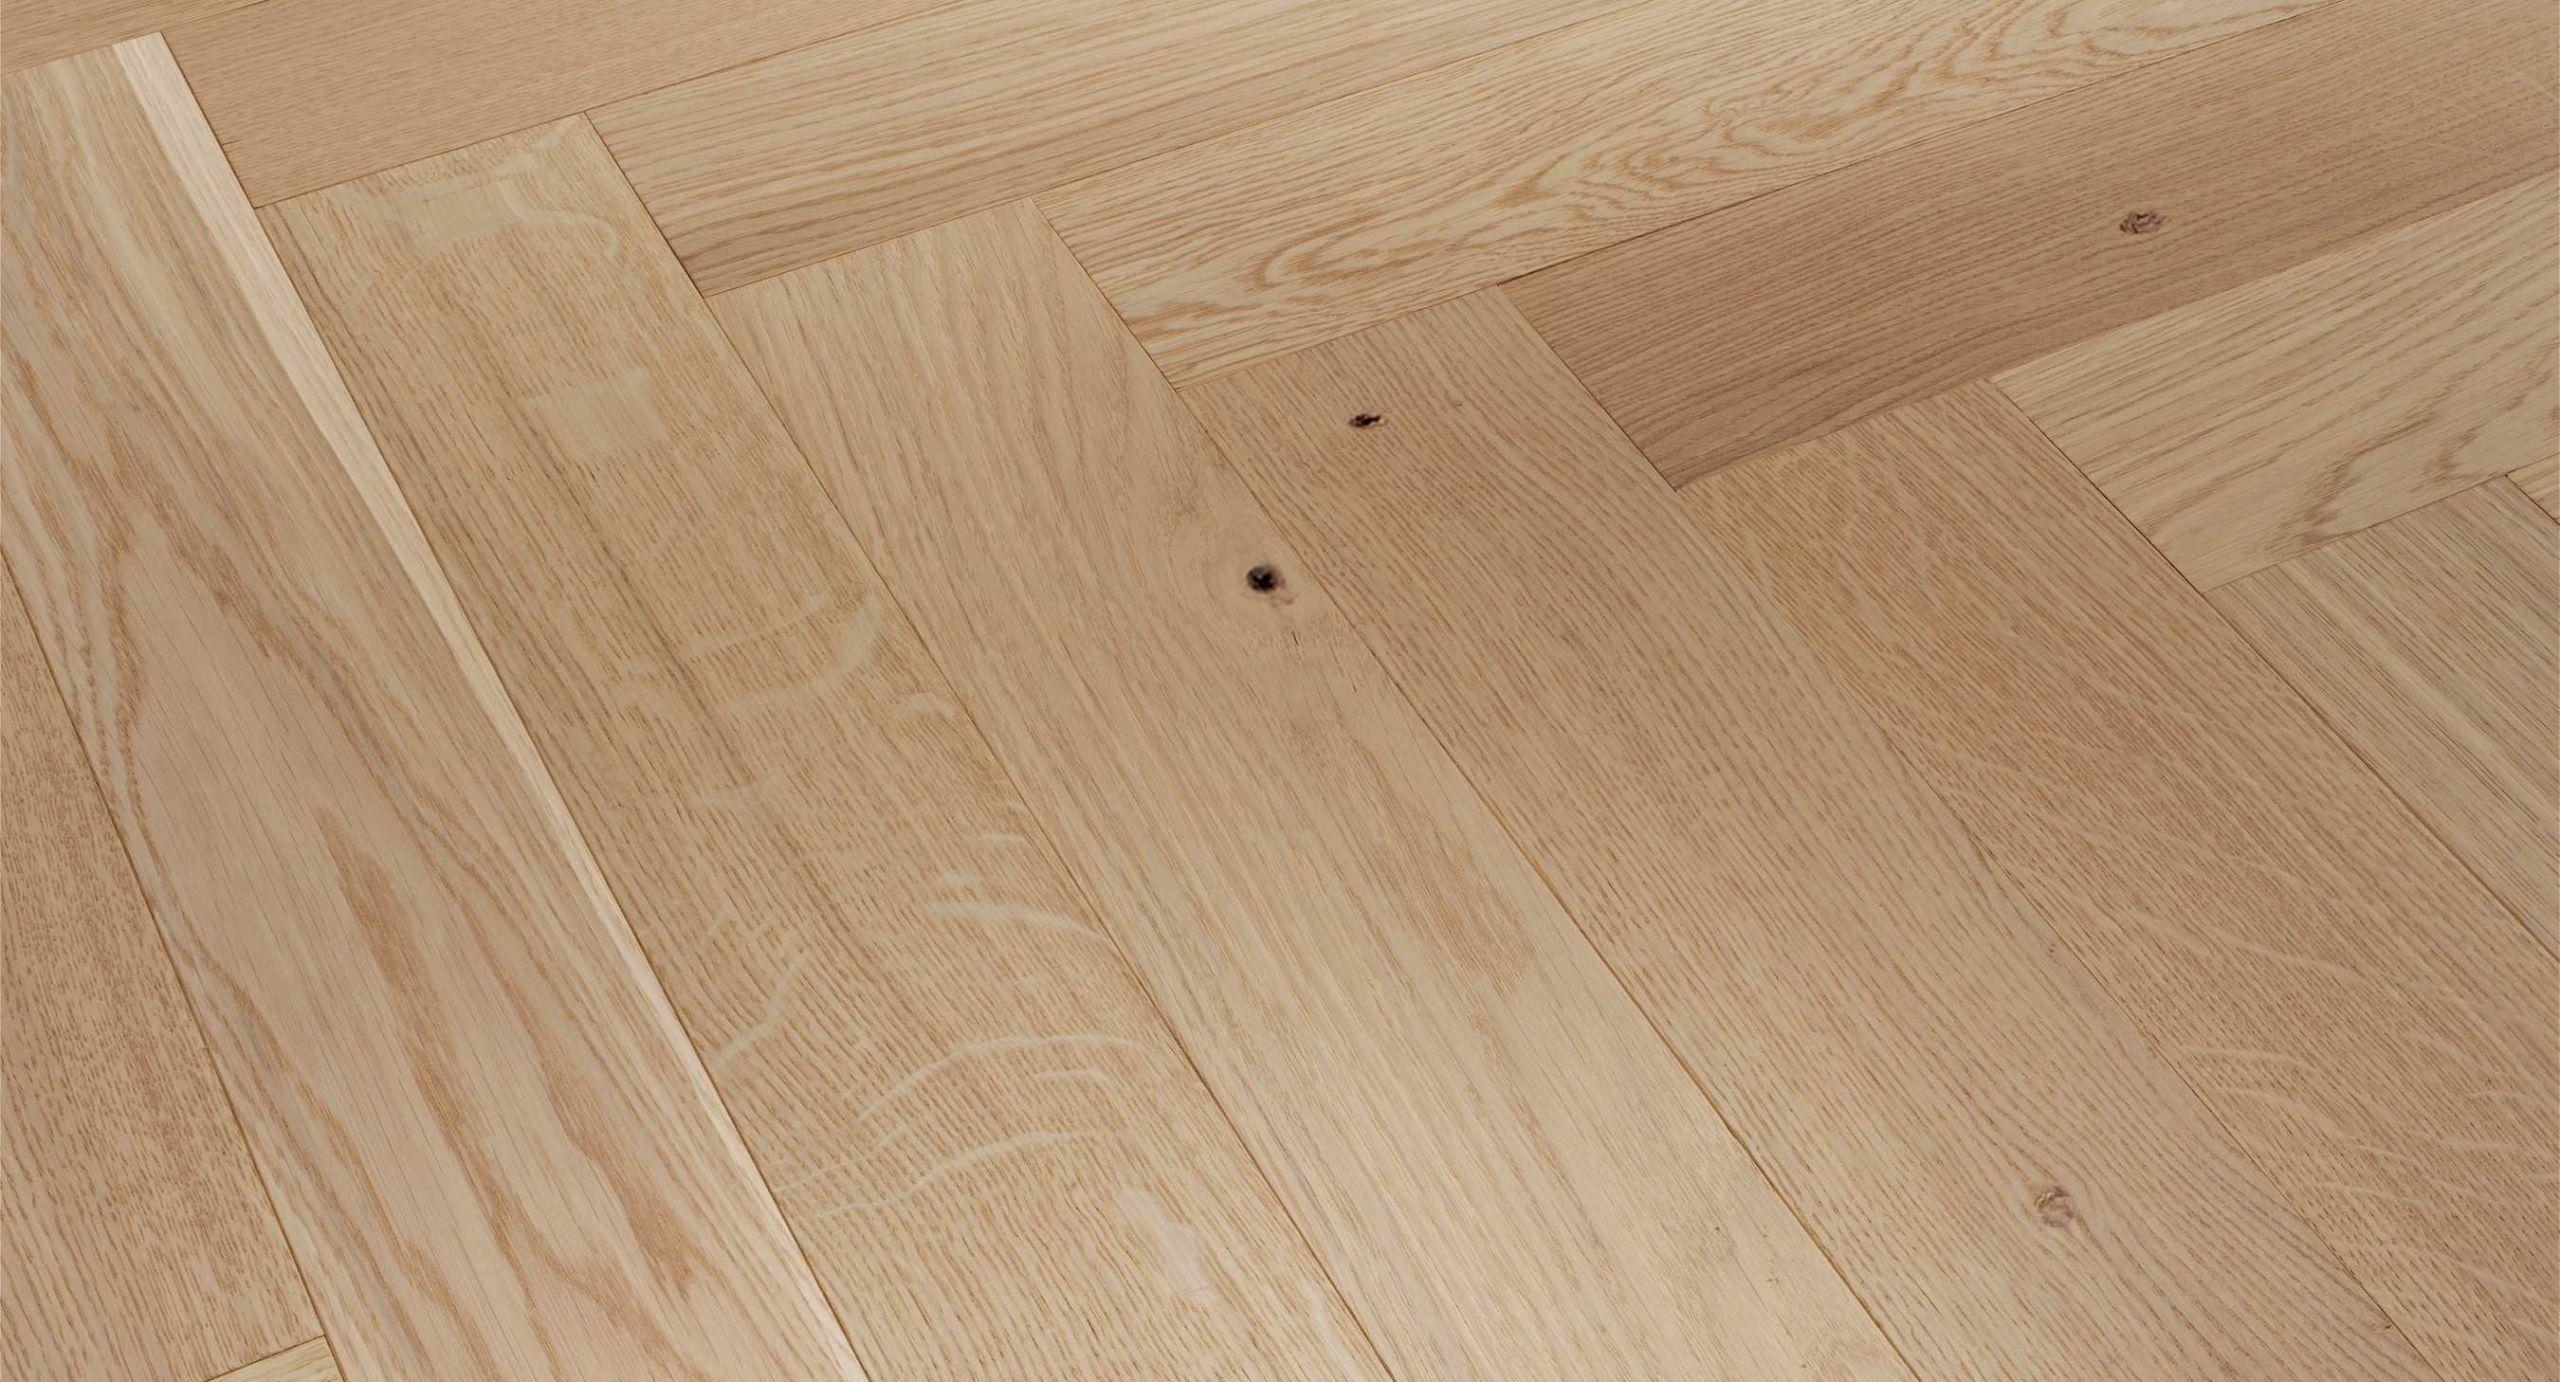 pvc hardwood flooring of laminate hardwood flooring new grundreinigung pvc und versieglung with laminate hardwood flooring elegant trendtime engineered wood flooring products of laminate har